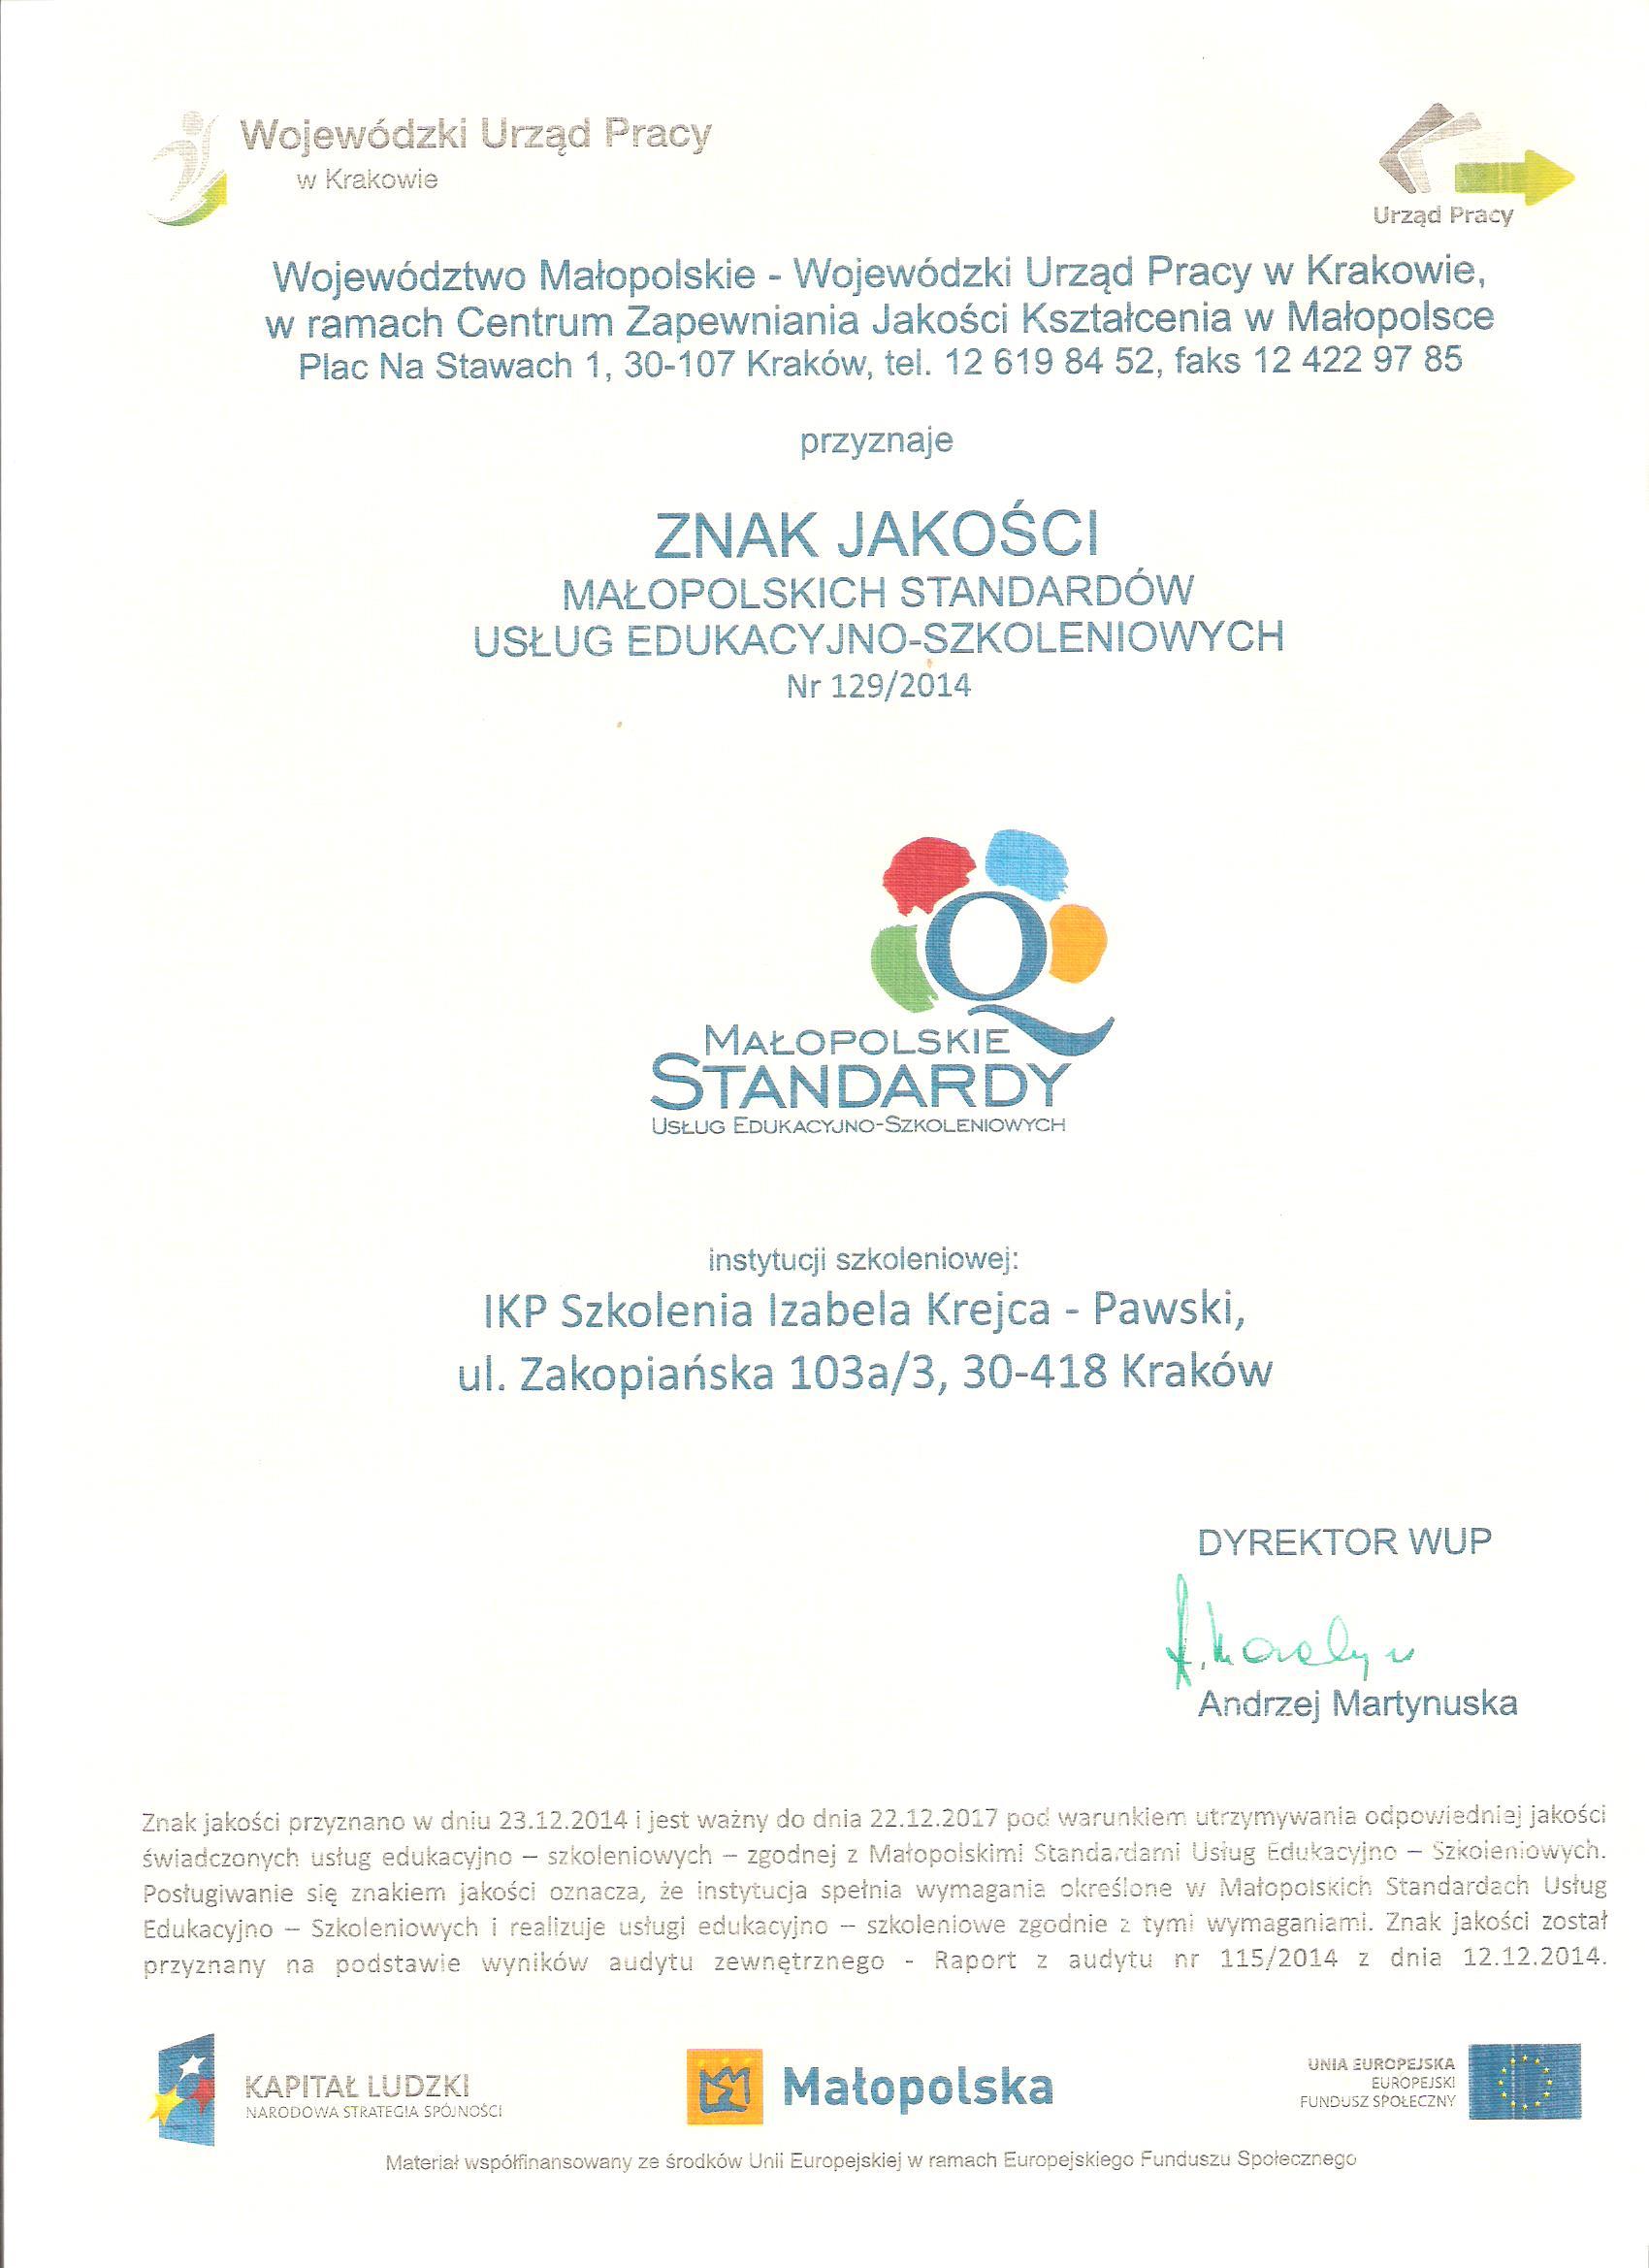 Certyfikat jakości MSUES 001